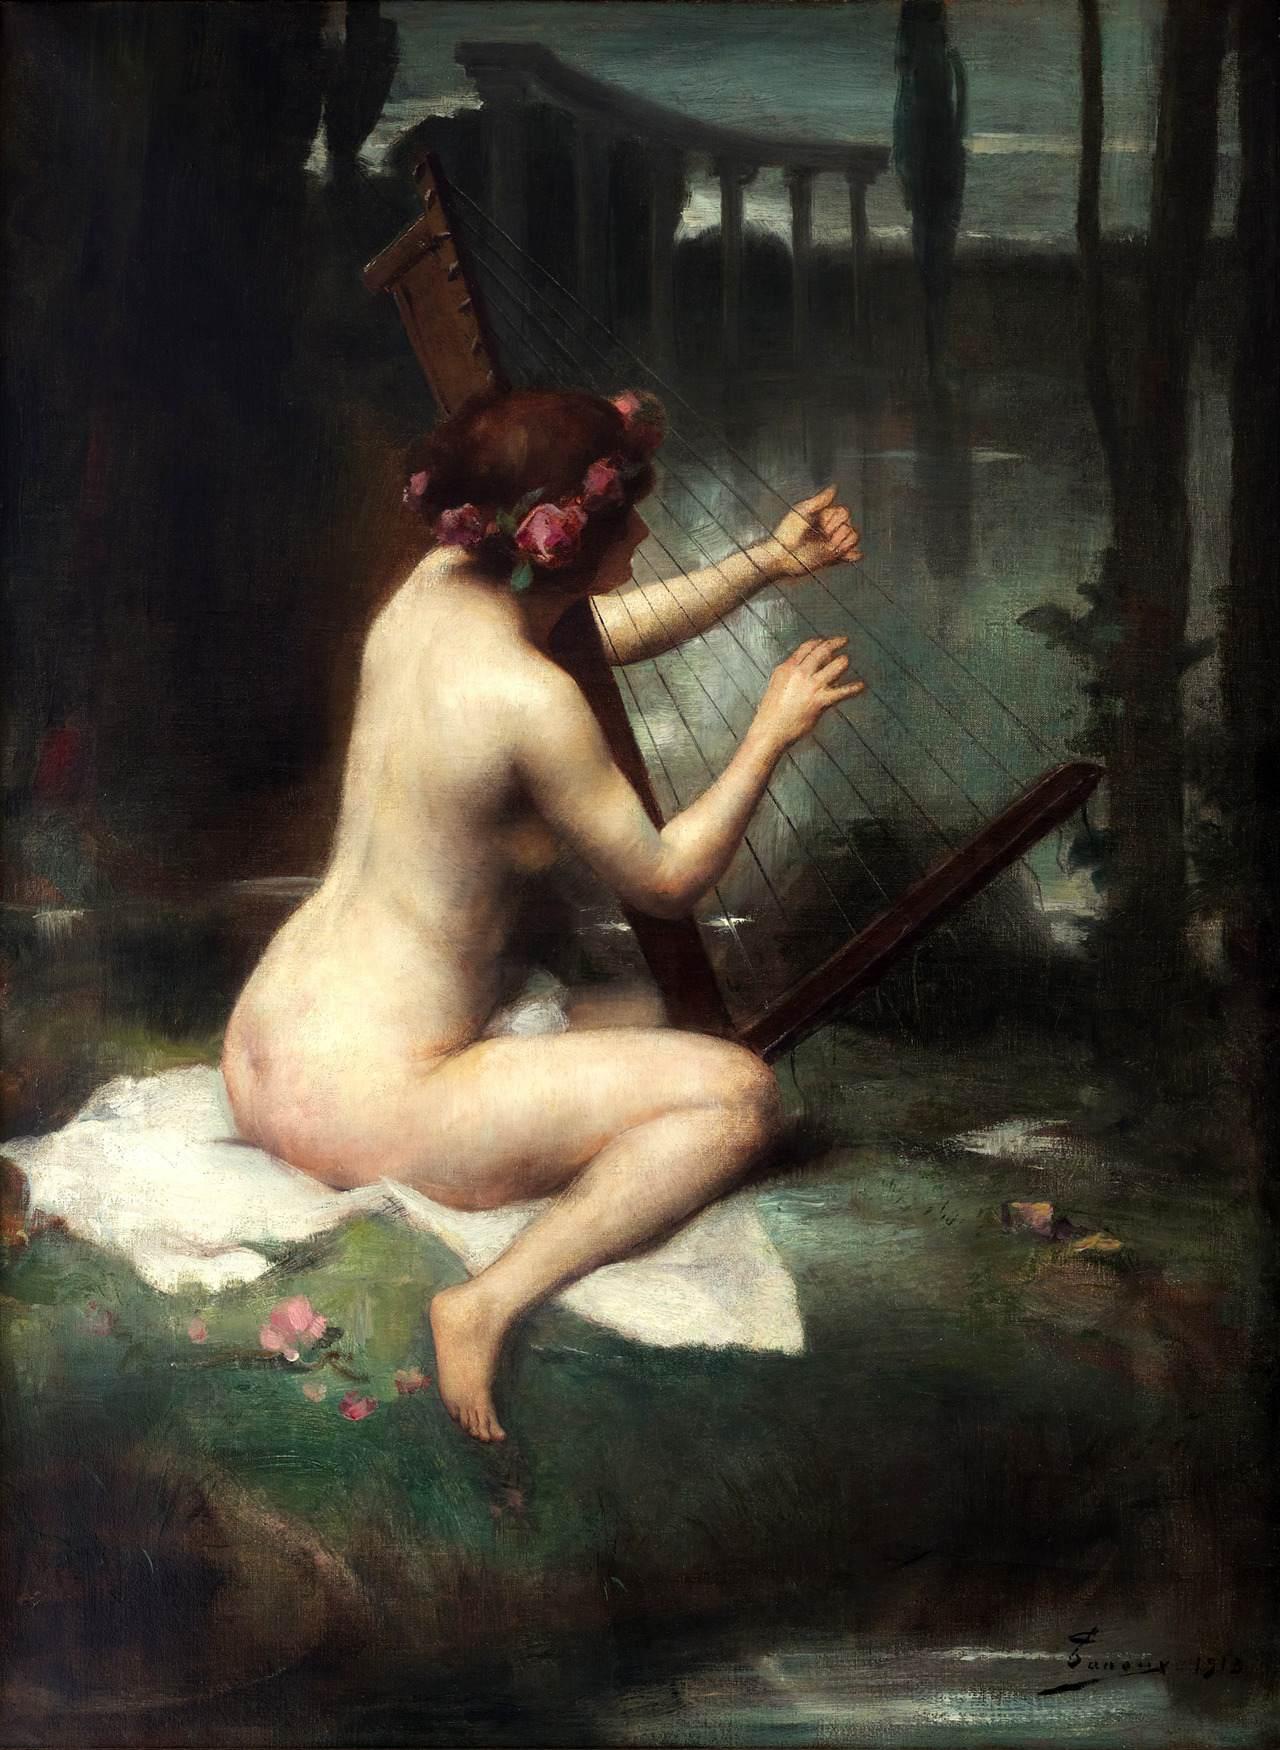 Adrien Henri Tanoux, 1865-1923. Игра на арфе. 1913. Частная коллекция